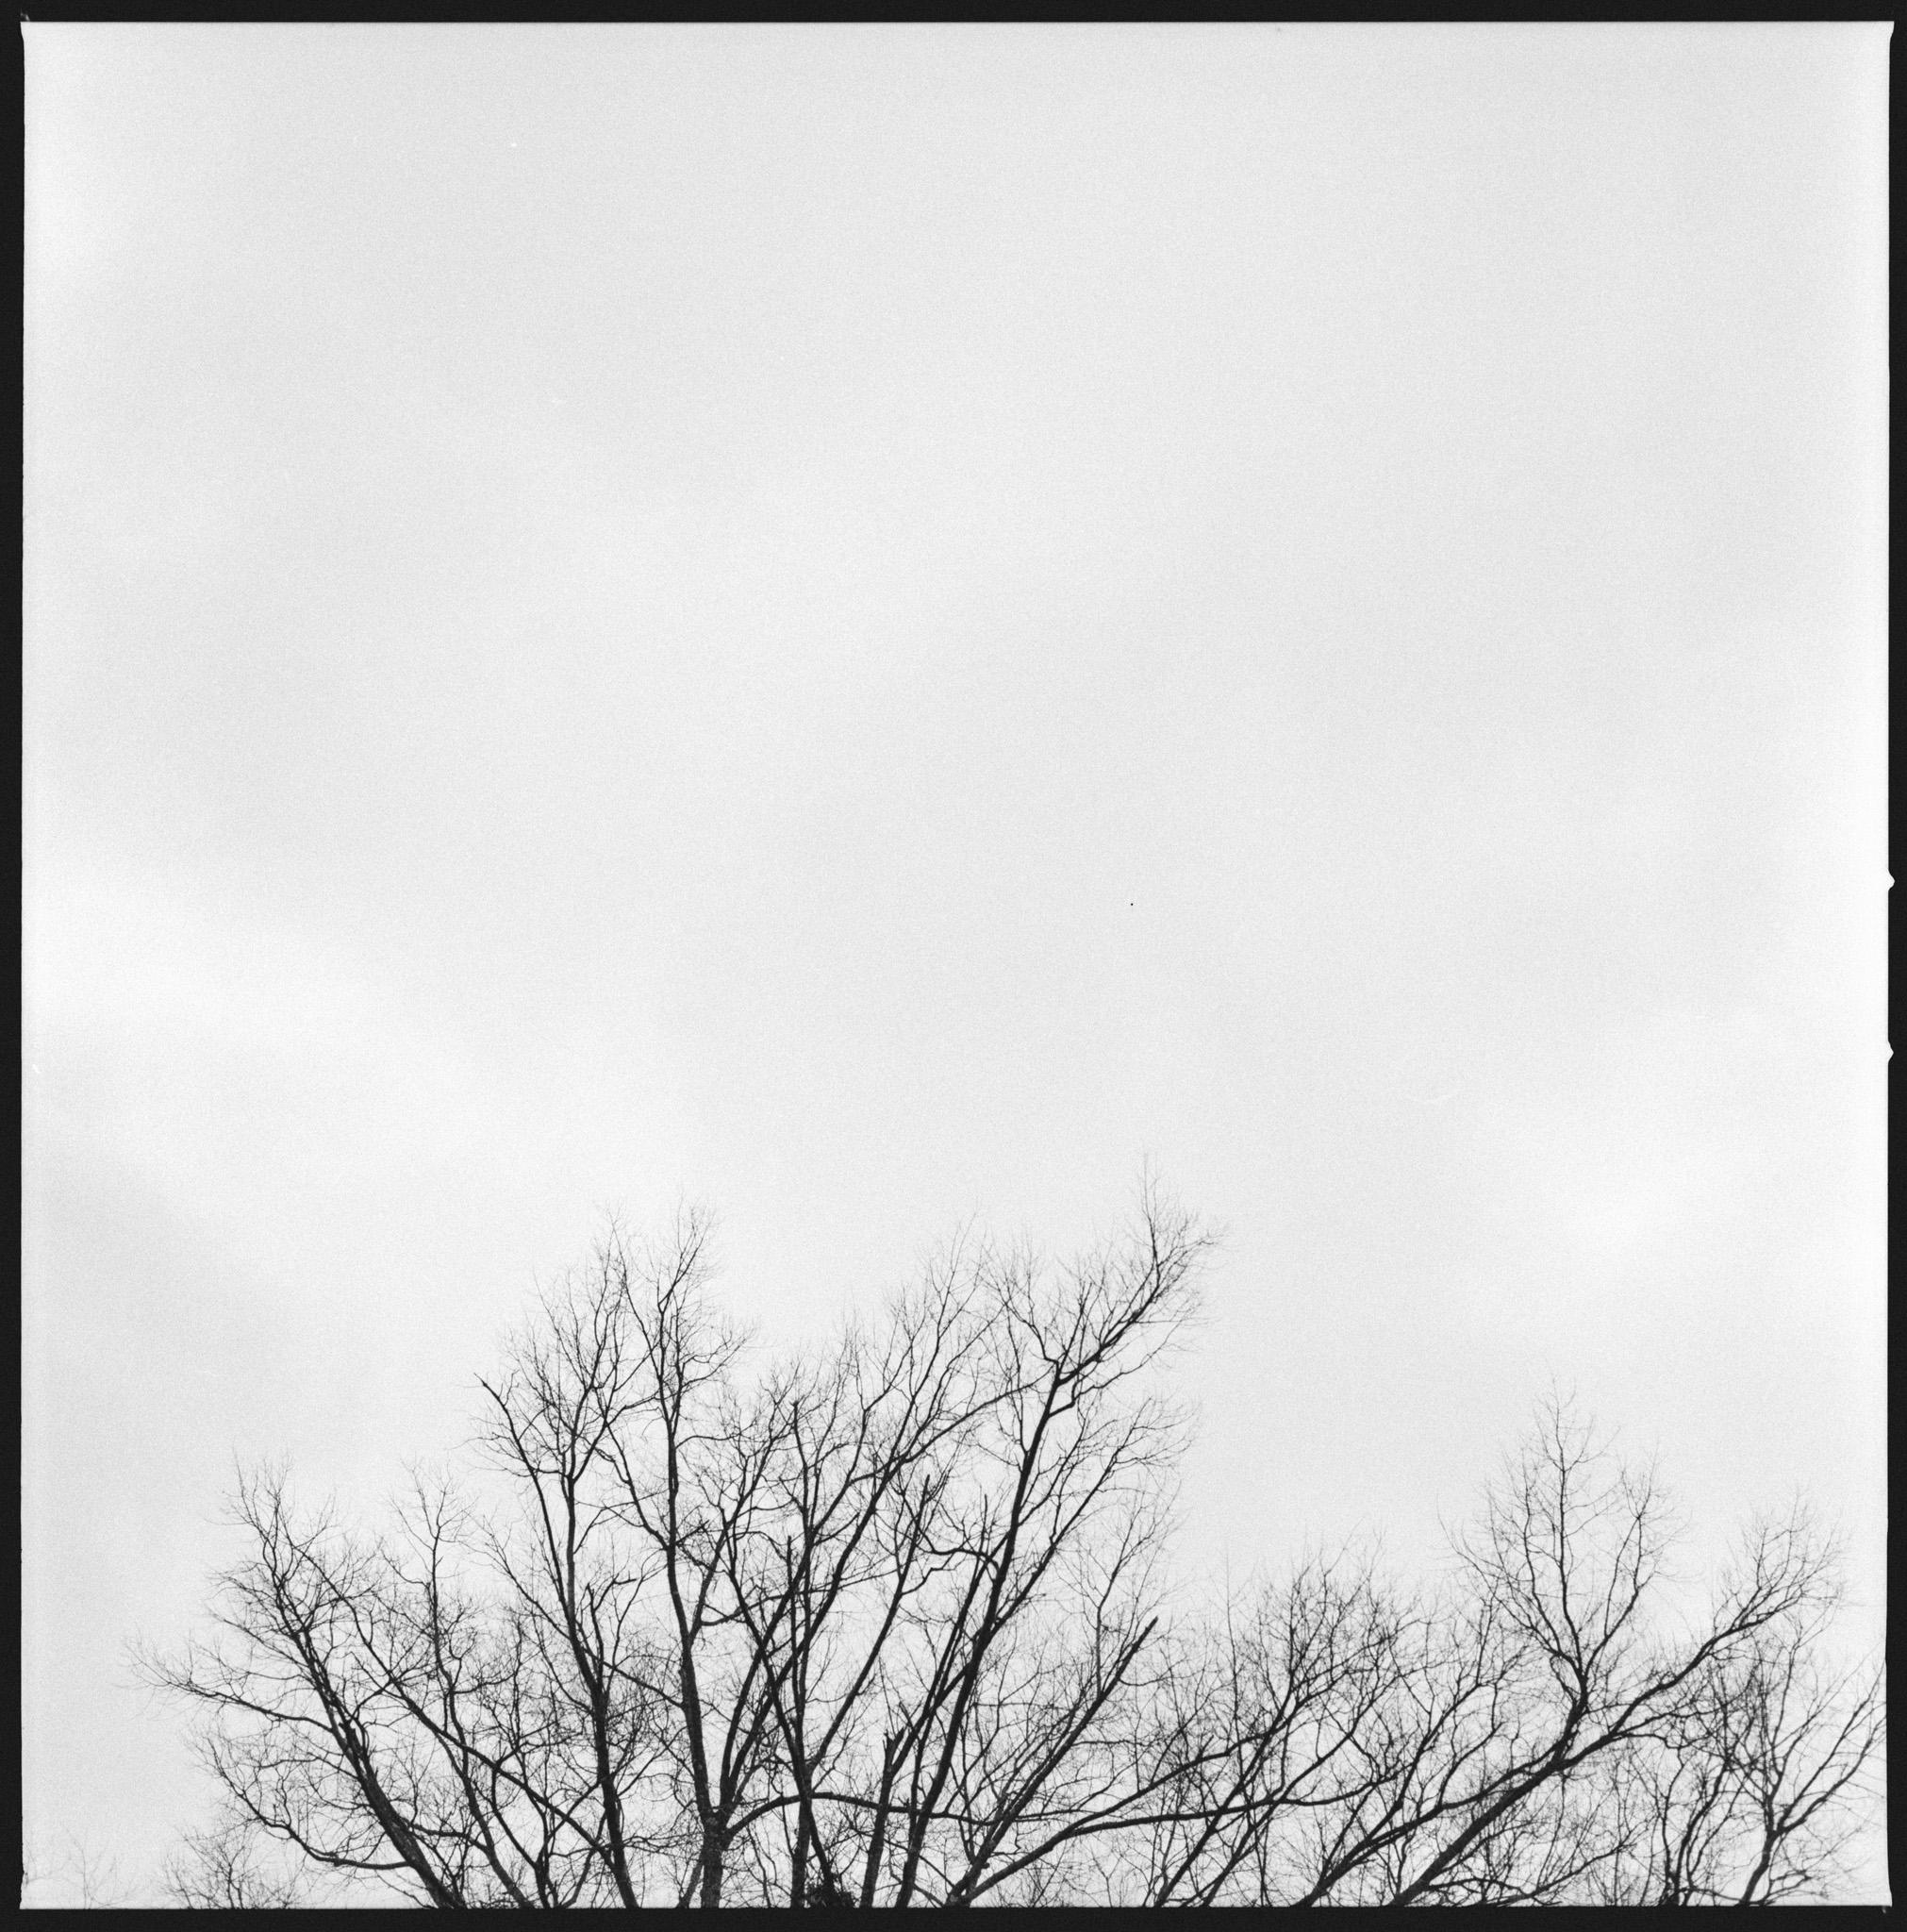 Photographer: Darkroom Portraits  Camera and Film: Hasselblad 501CM and Hp5+  © 2016 Darkroom Portraits